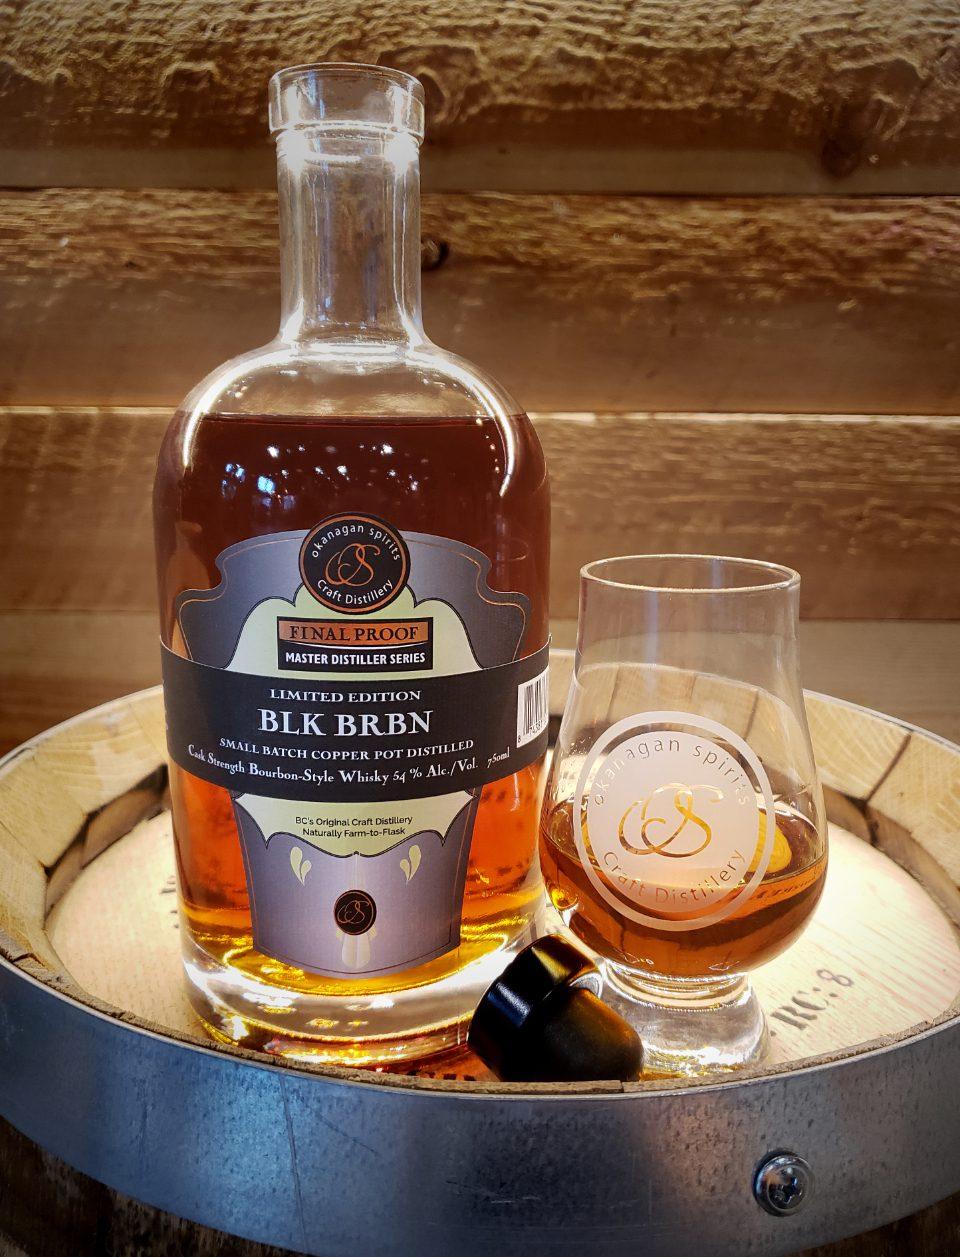 BLK BRBN Cask Strength Bourbon-Style Whisky